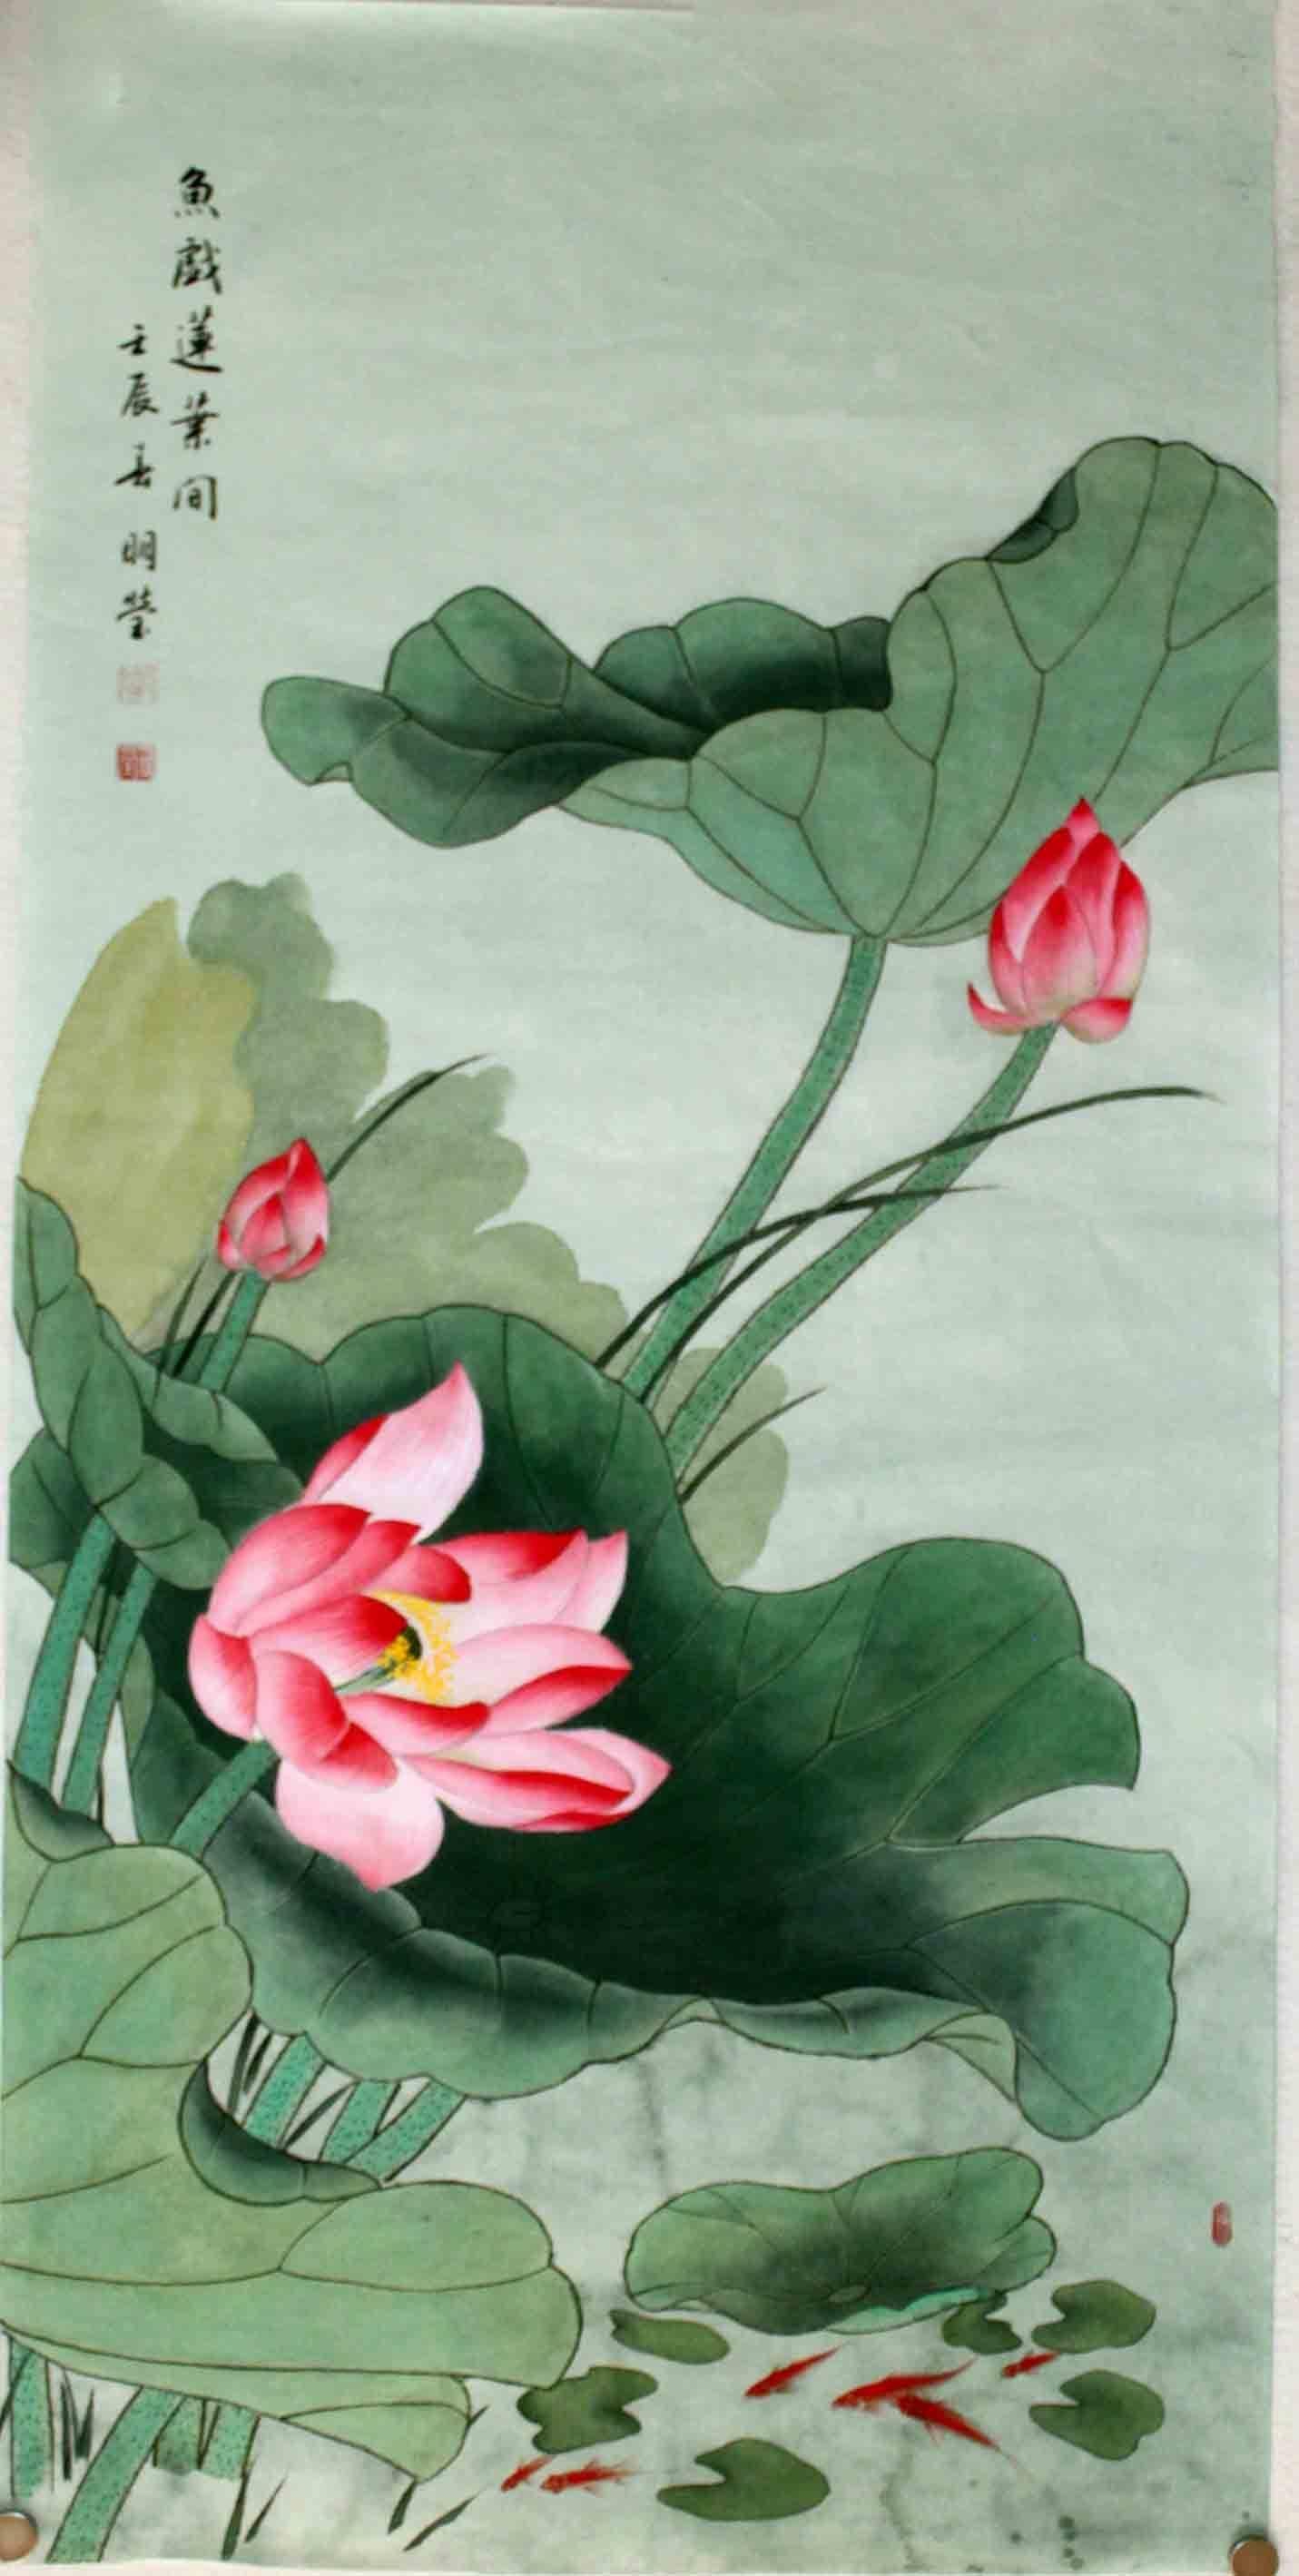 Jp fish swimming among lotus leaves chinese painting lotus jp fish swimming among lotus leaves chinese painting izmirmasajfo